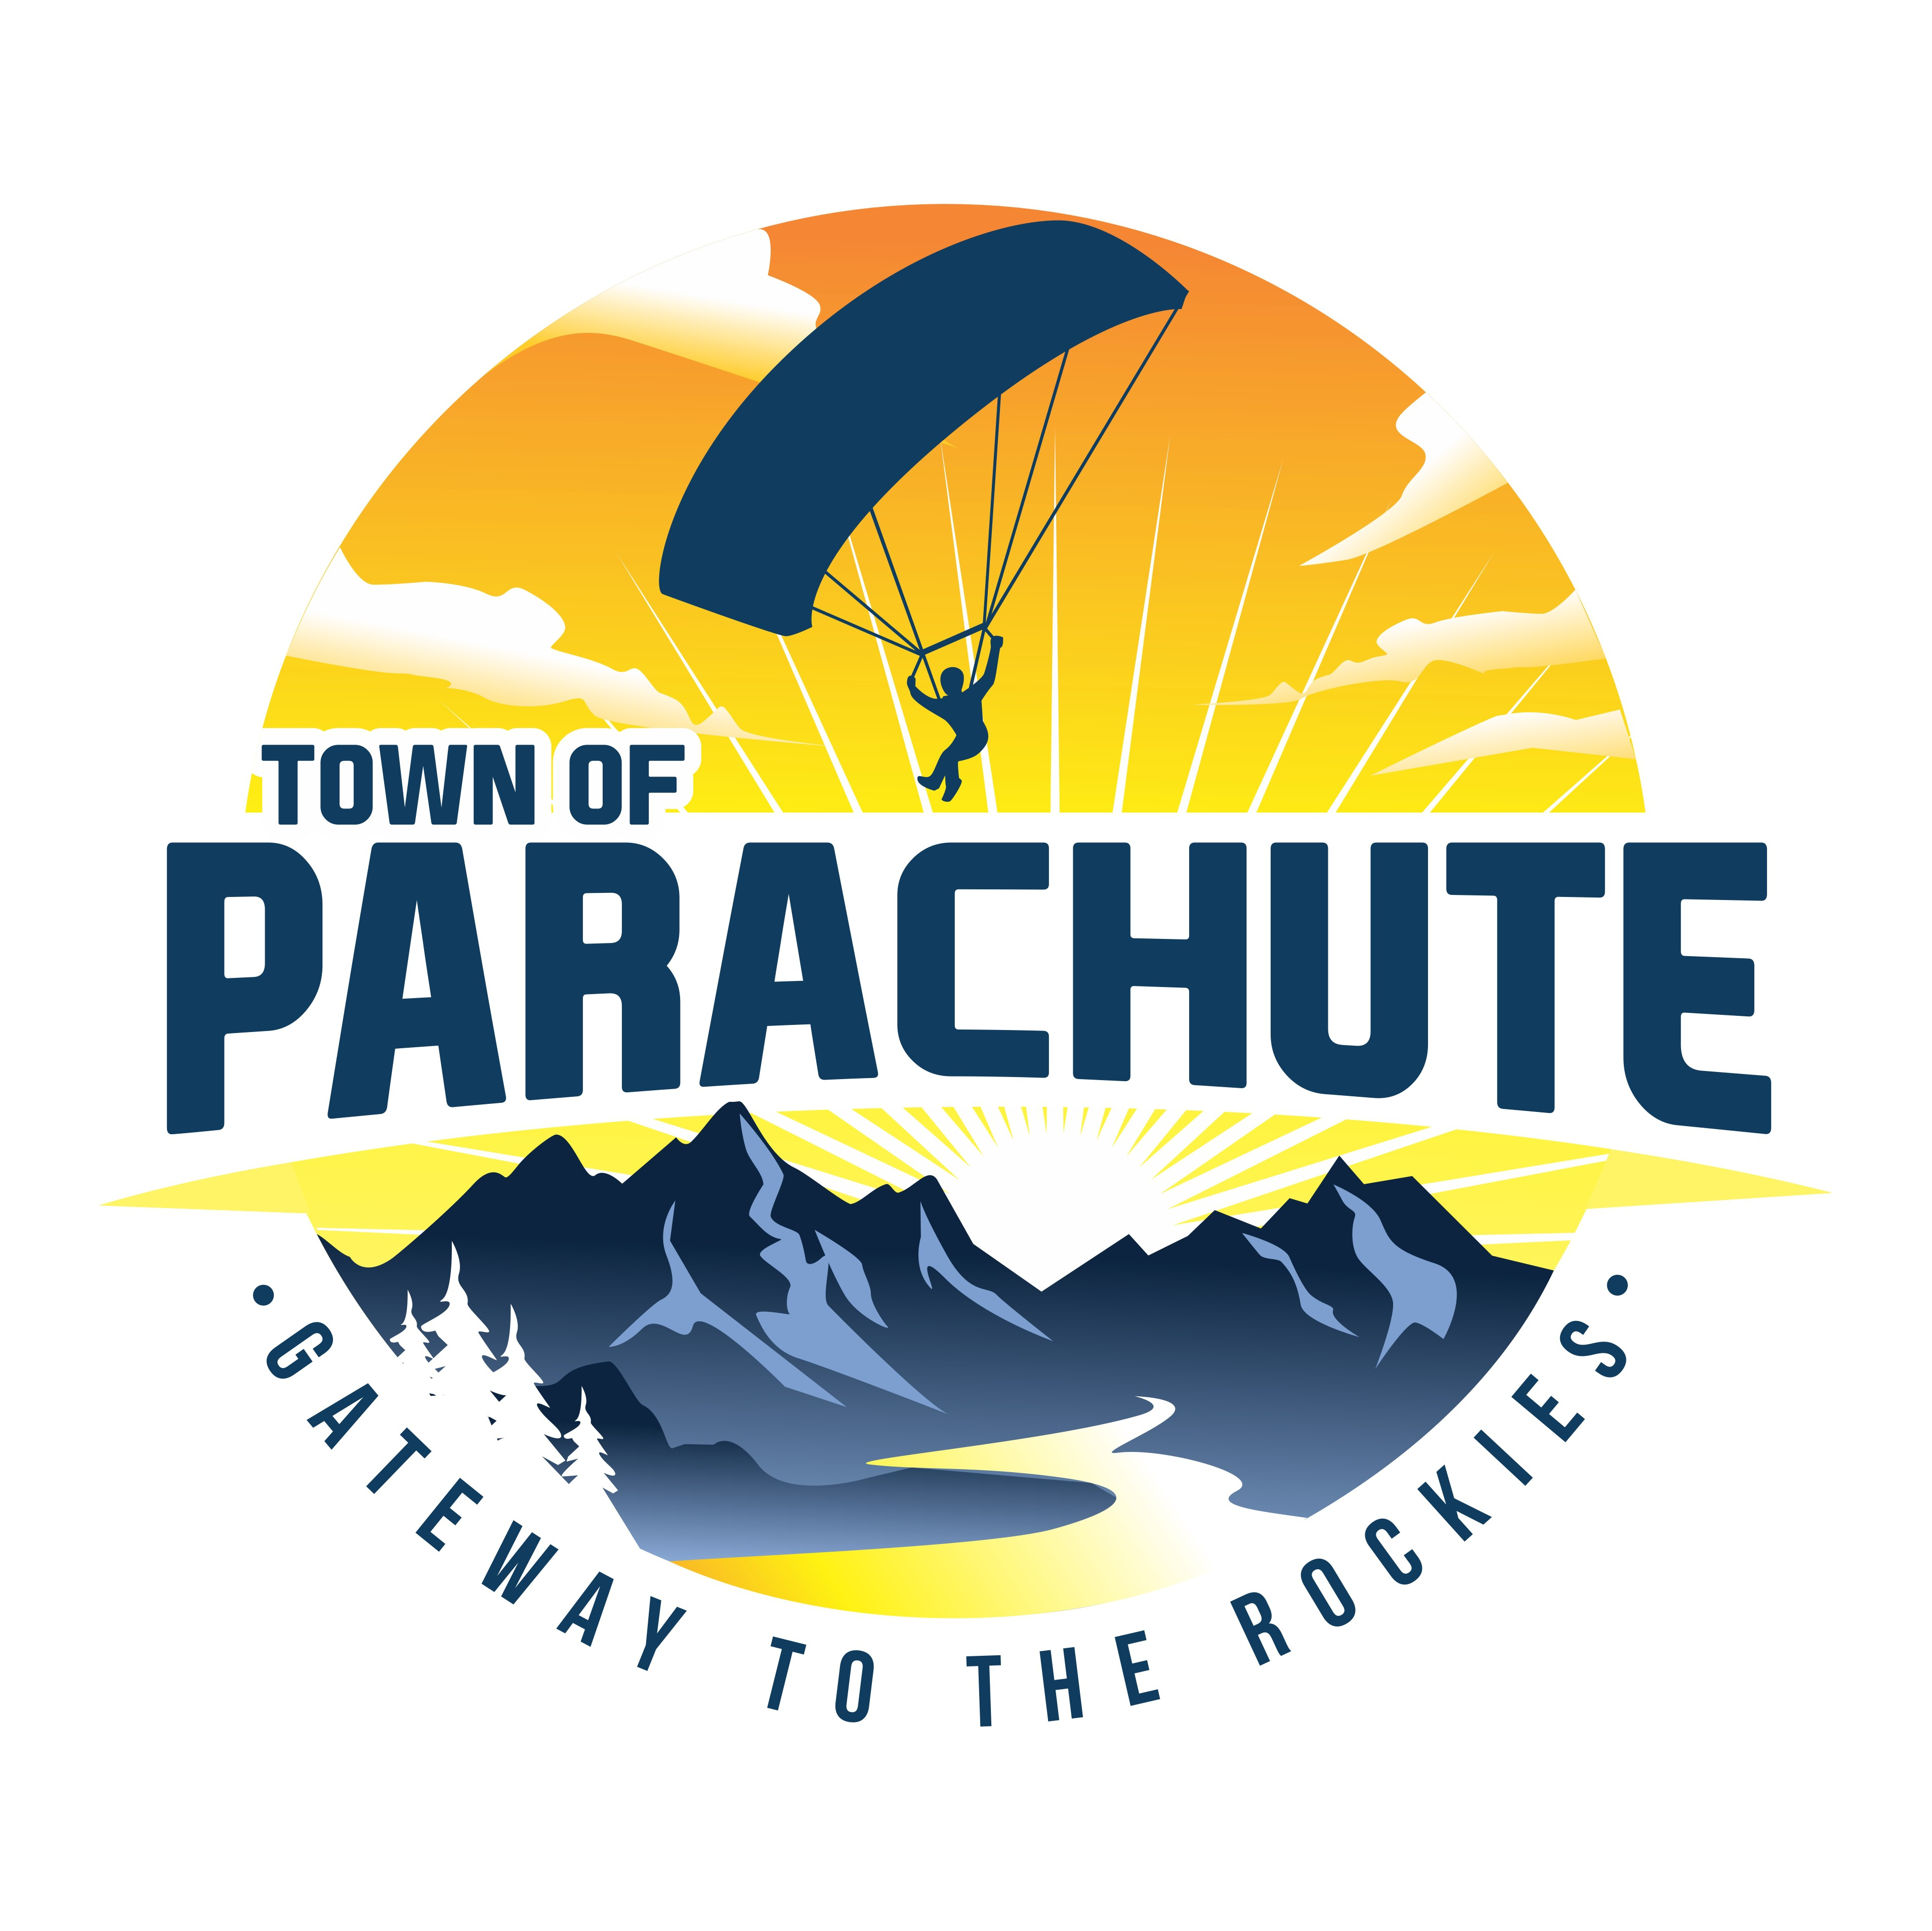 Scenic community logo